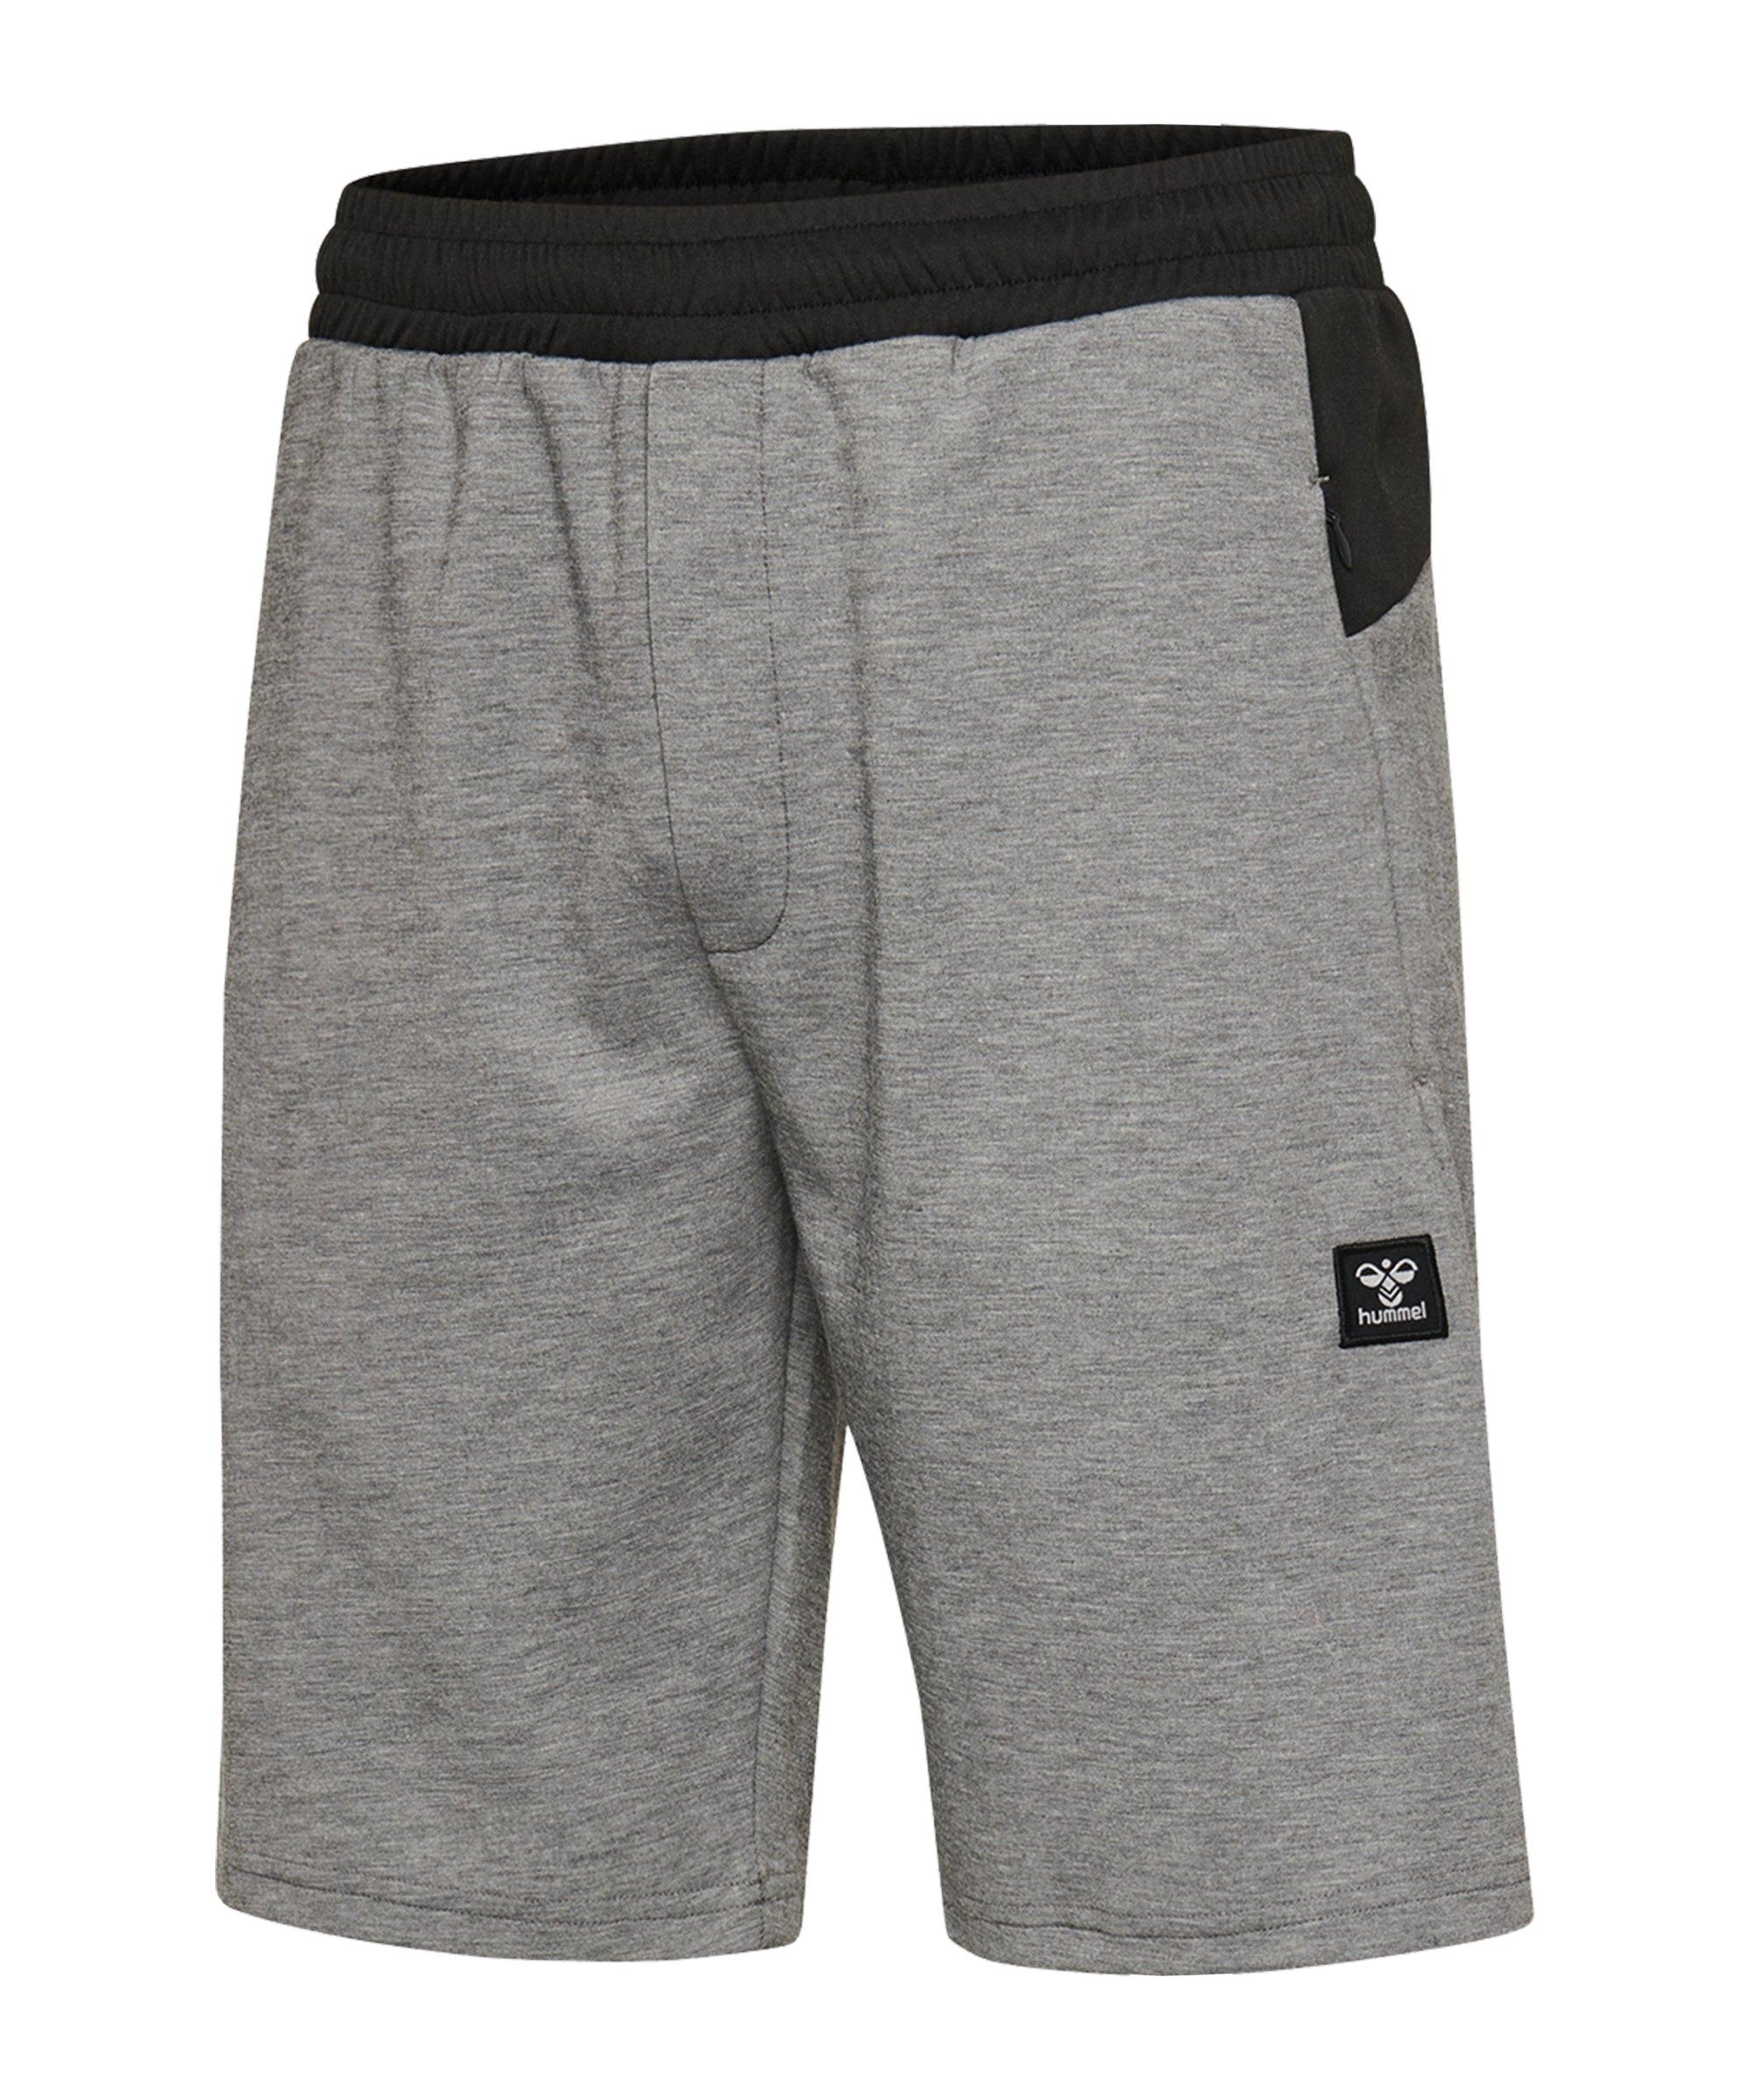 Hummel Tropper Shorts Grau F2006 - grau